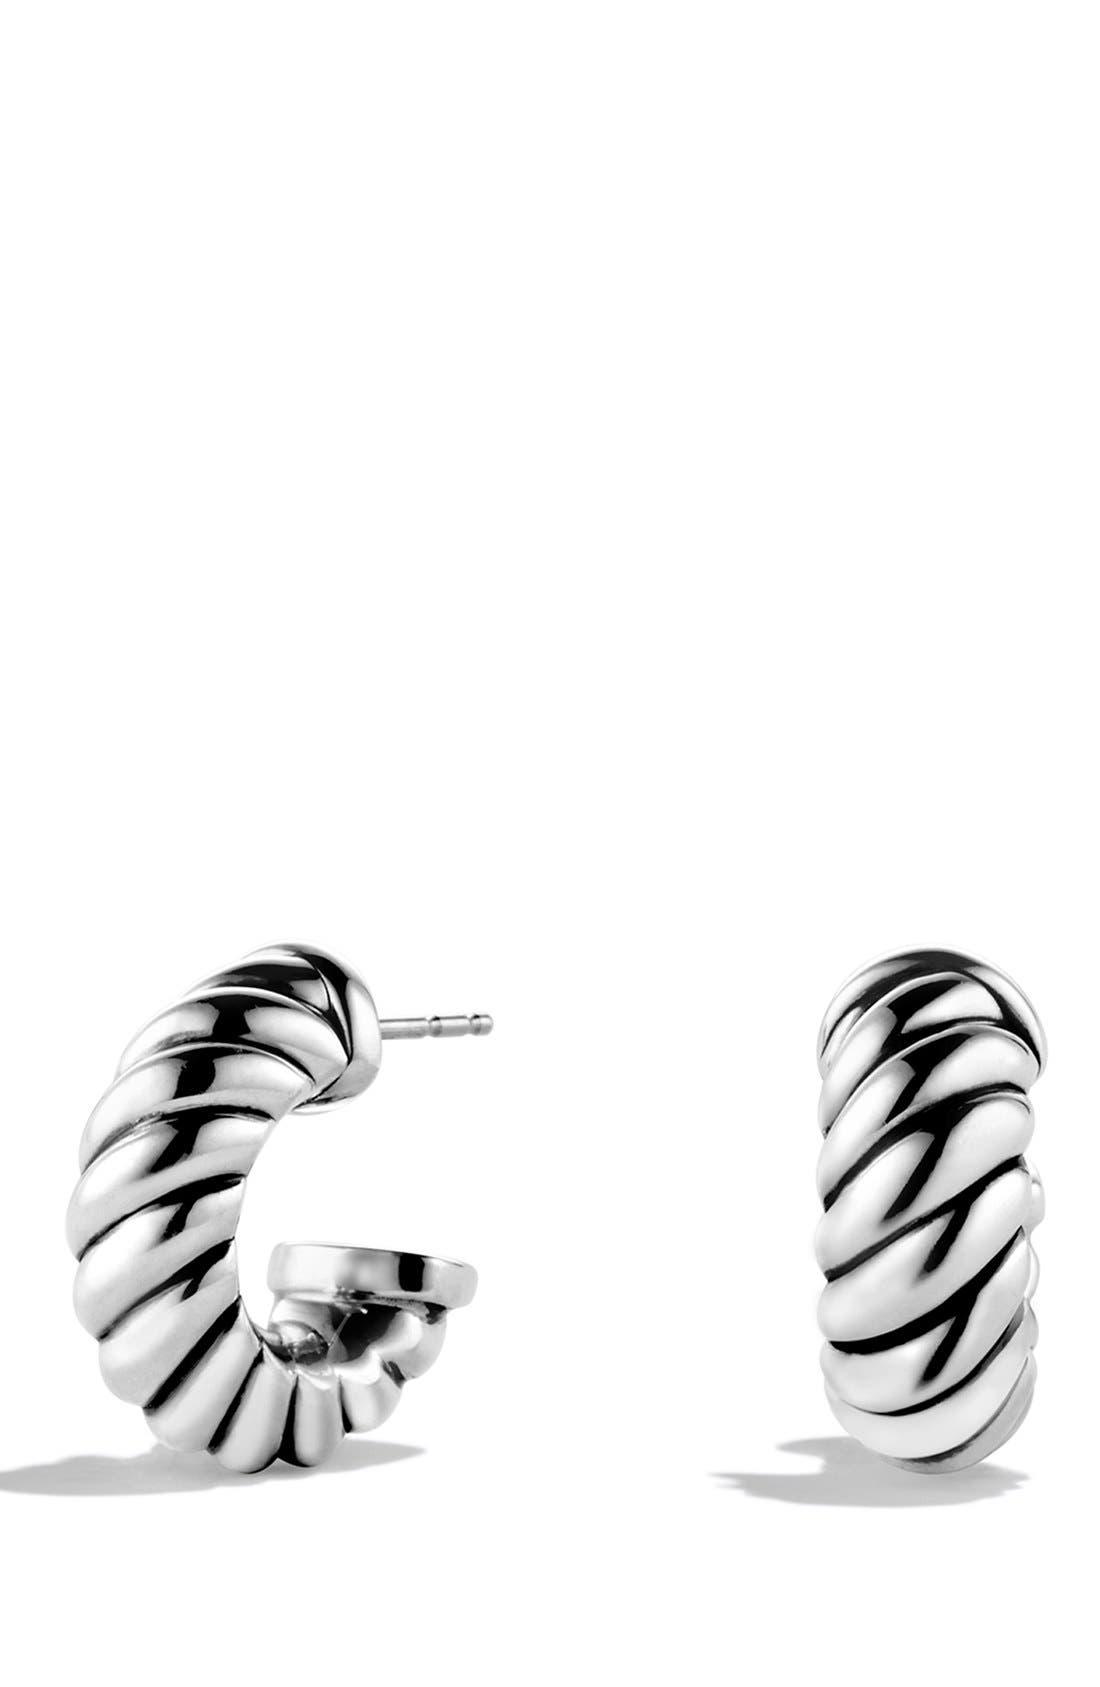 'Cable Classics' Shrimp Earrings,                             Main thumbnail 1, color,                             Silver